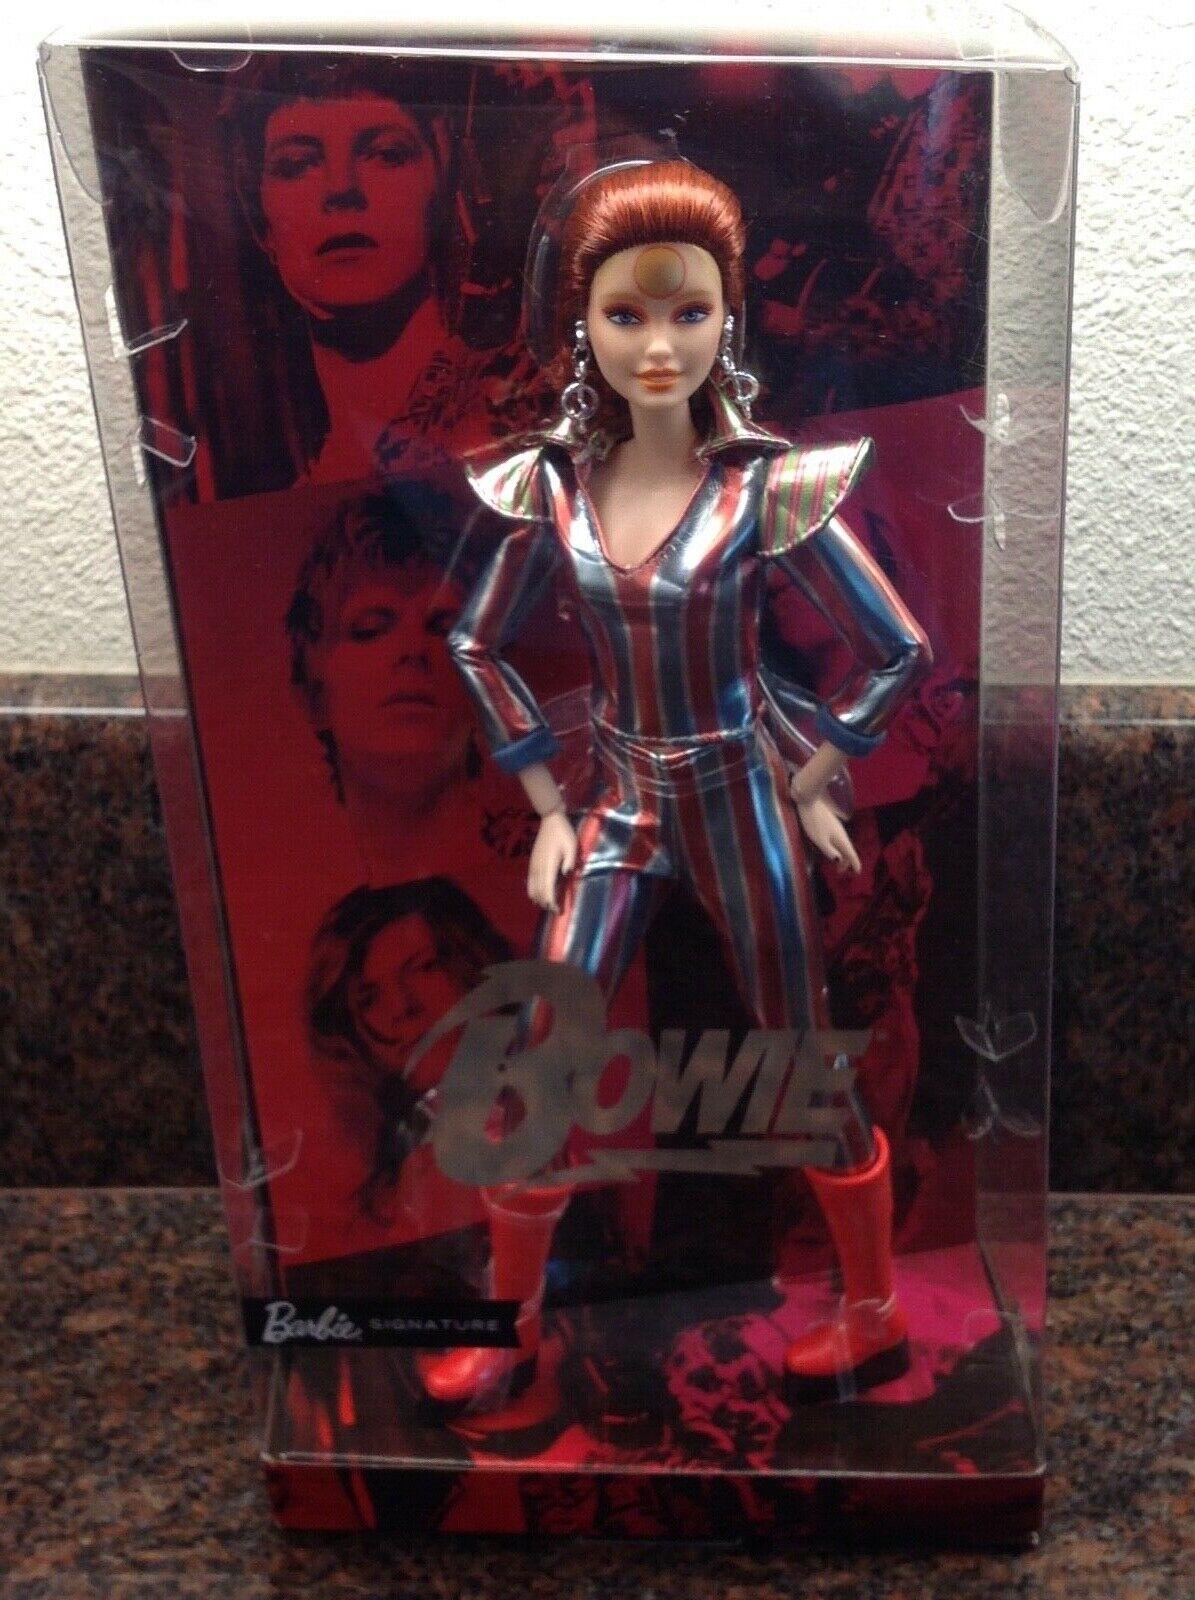 New in Box David Bowie Barbie